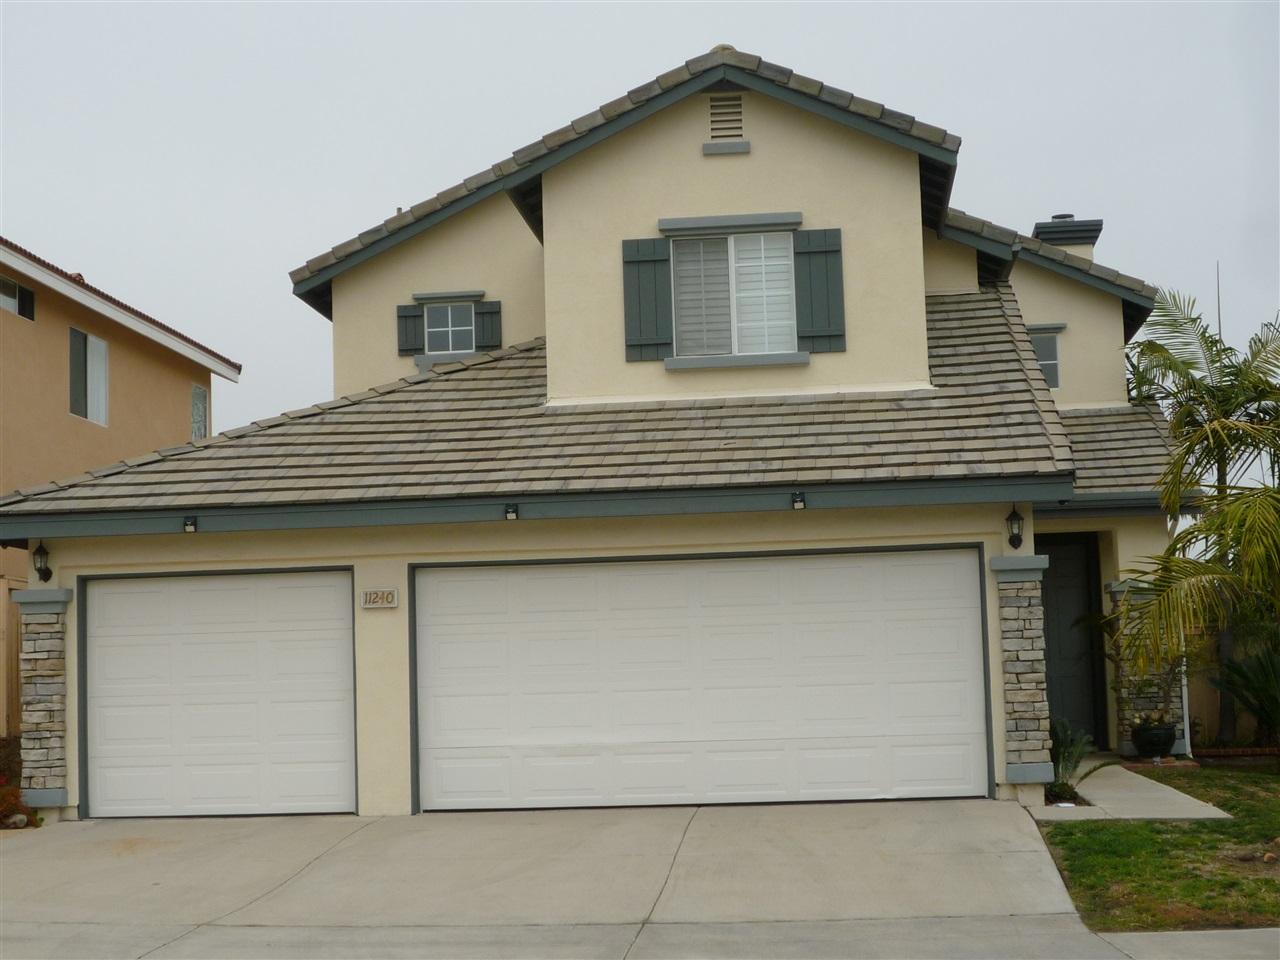 11240 Pacemont Ln, San Diego, CA